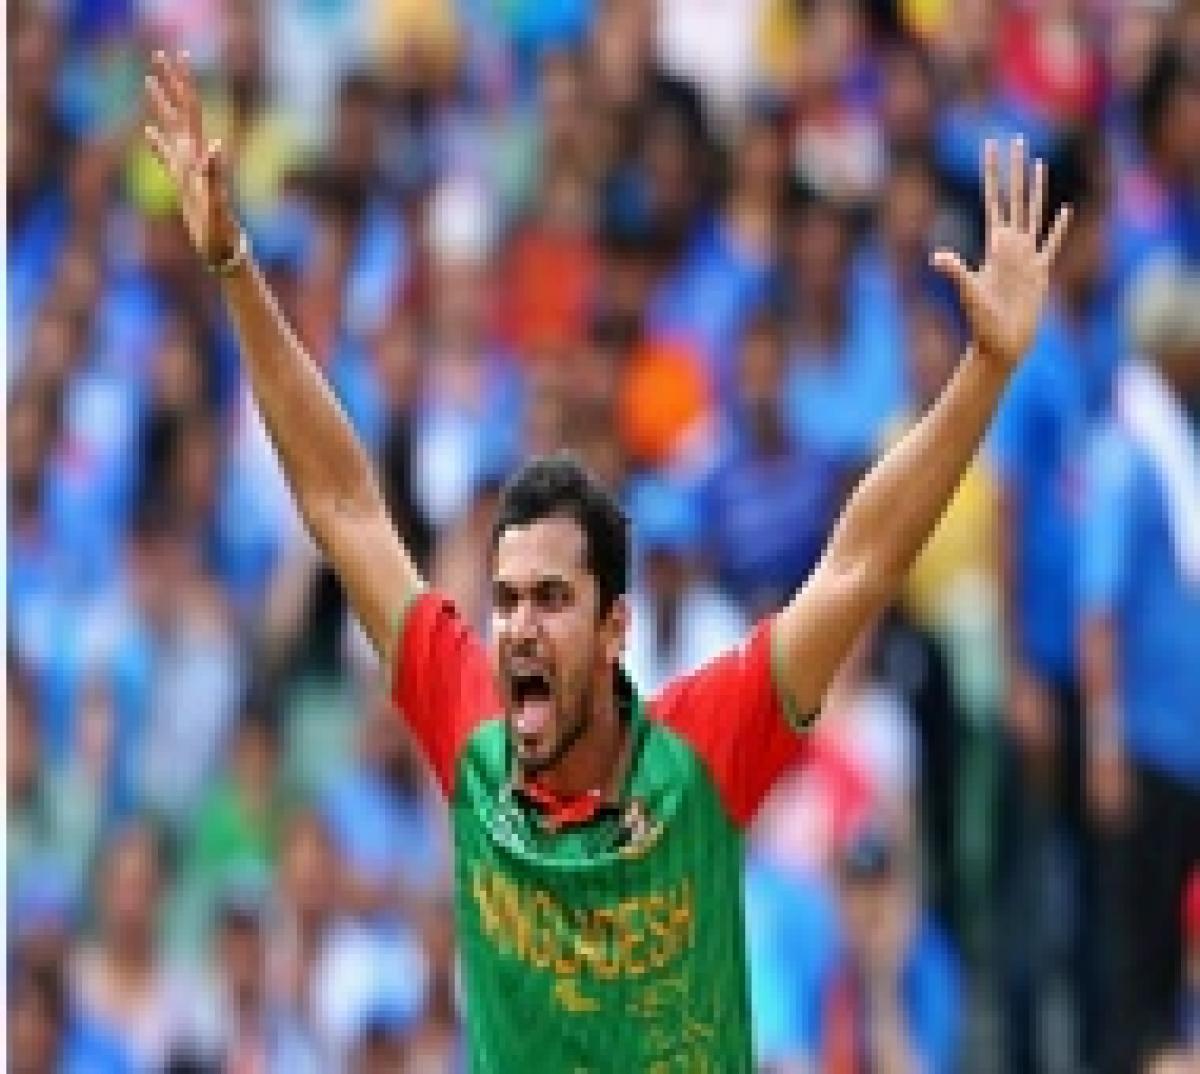 Small mistakes led to defeat: Bangladesh captain Mortaza